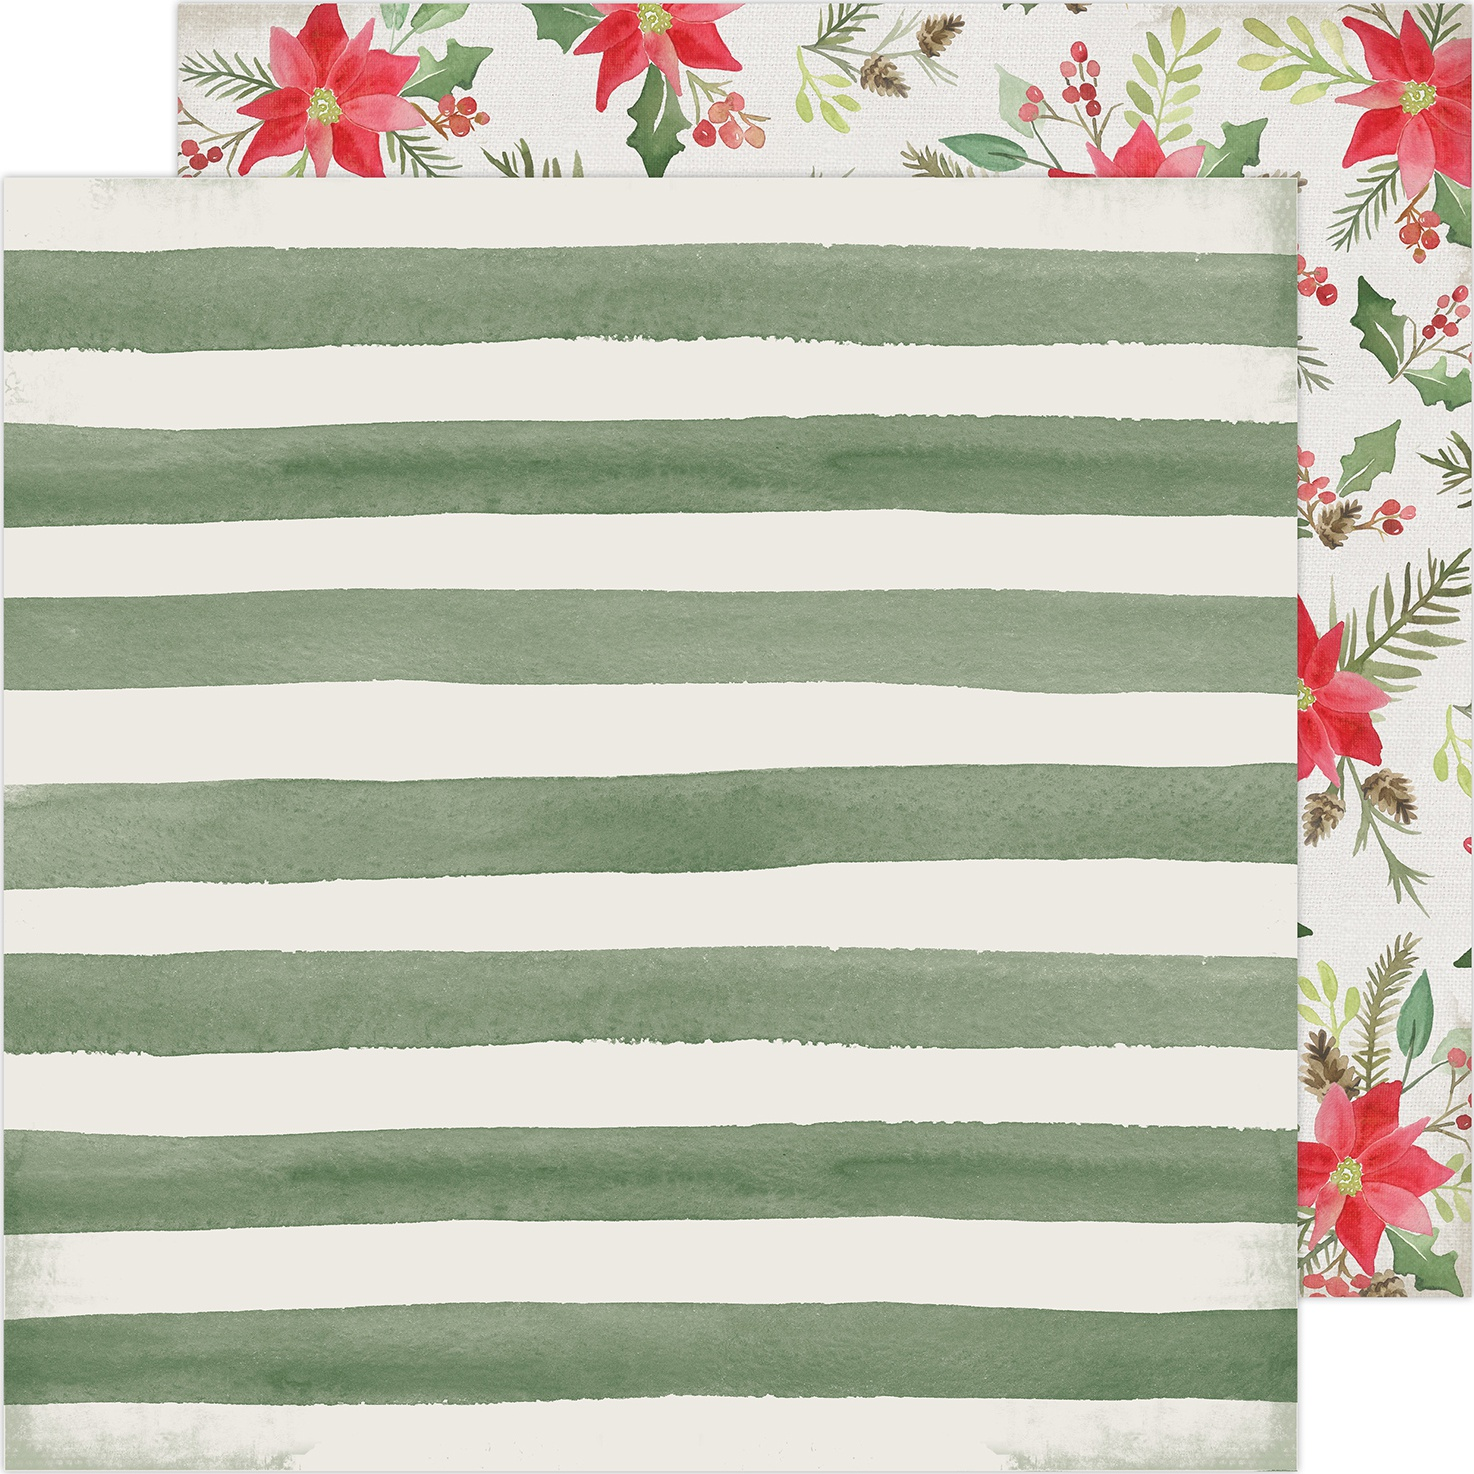 Heidi Swapp Winter Wonderland Double-Sided Cardstock 12X12-Poinsettia Lane